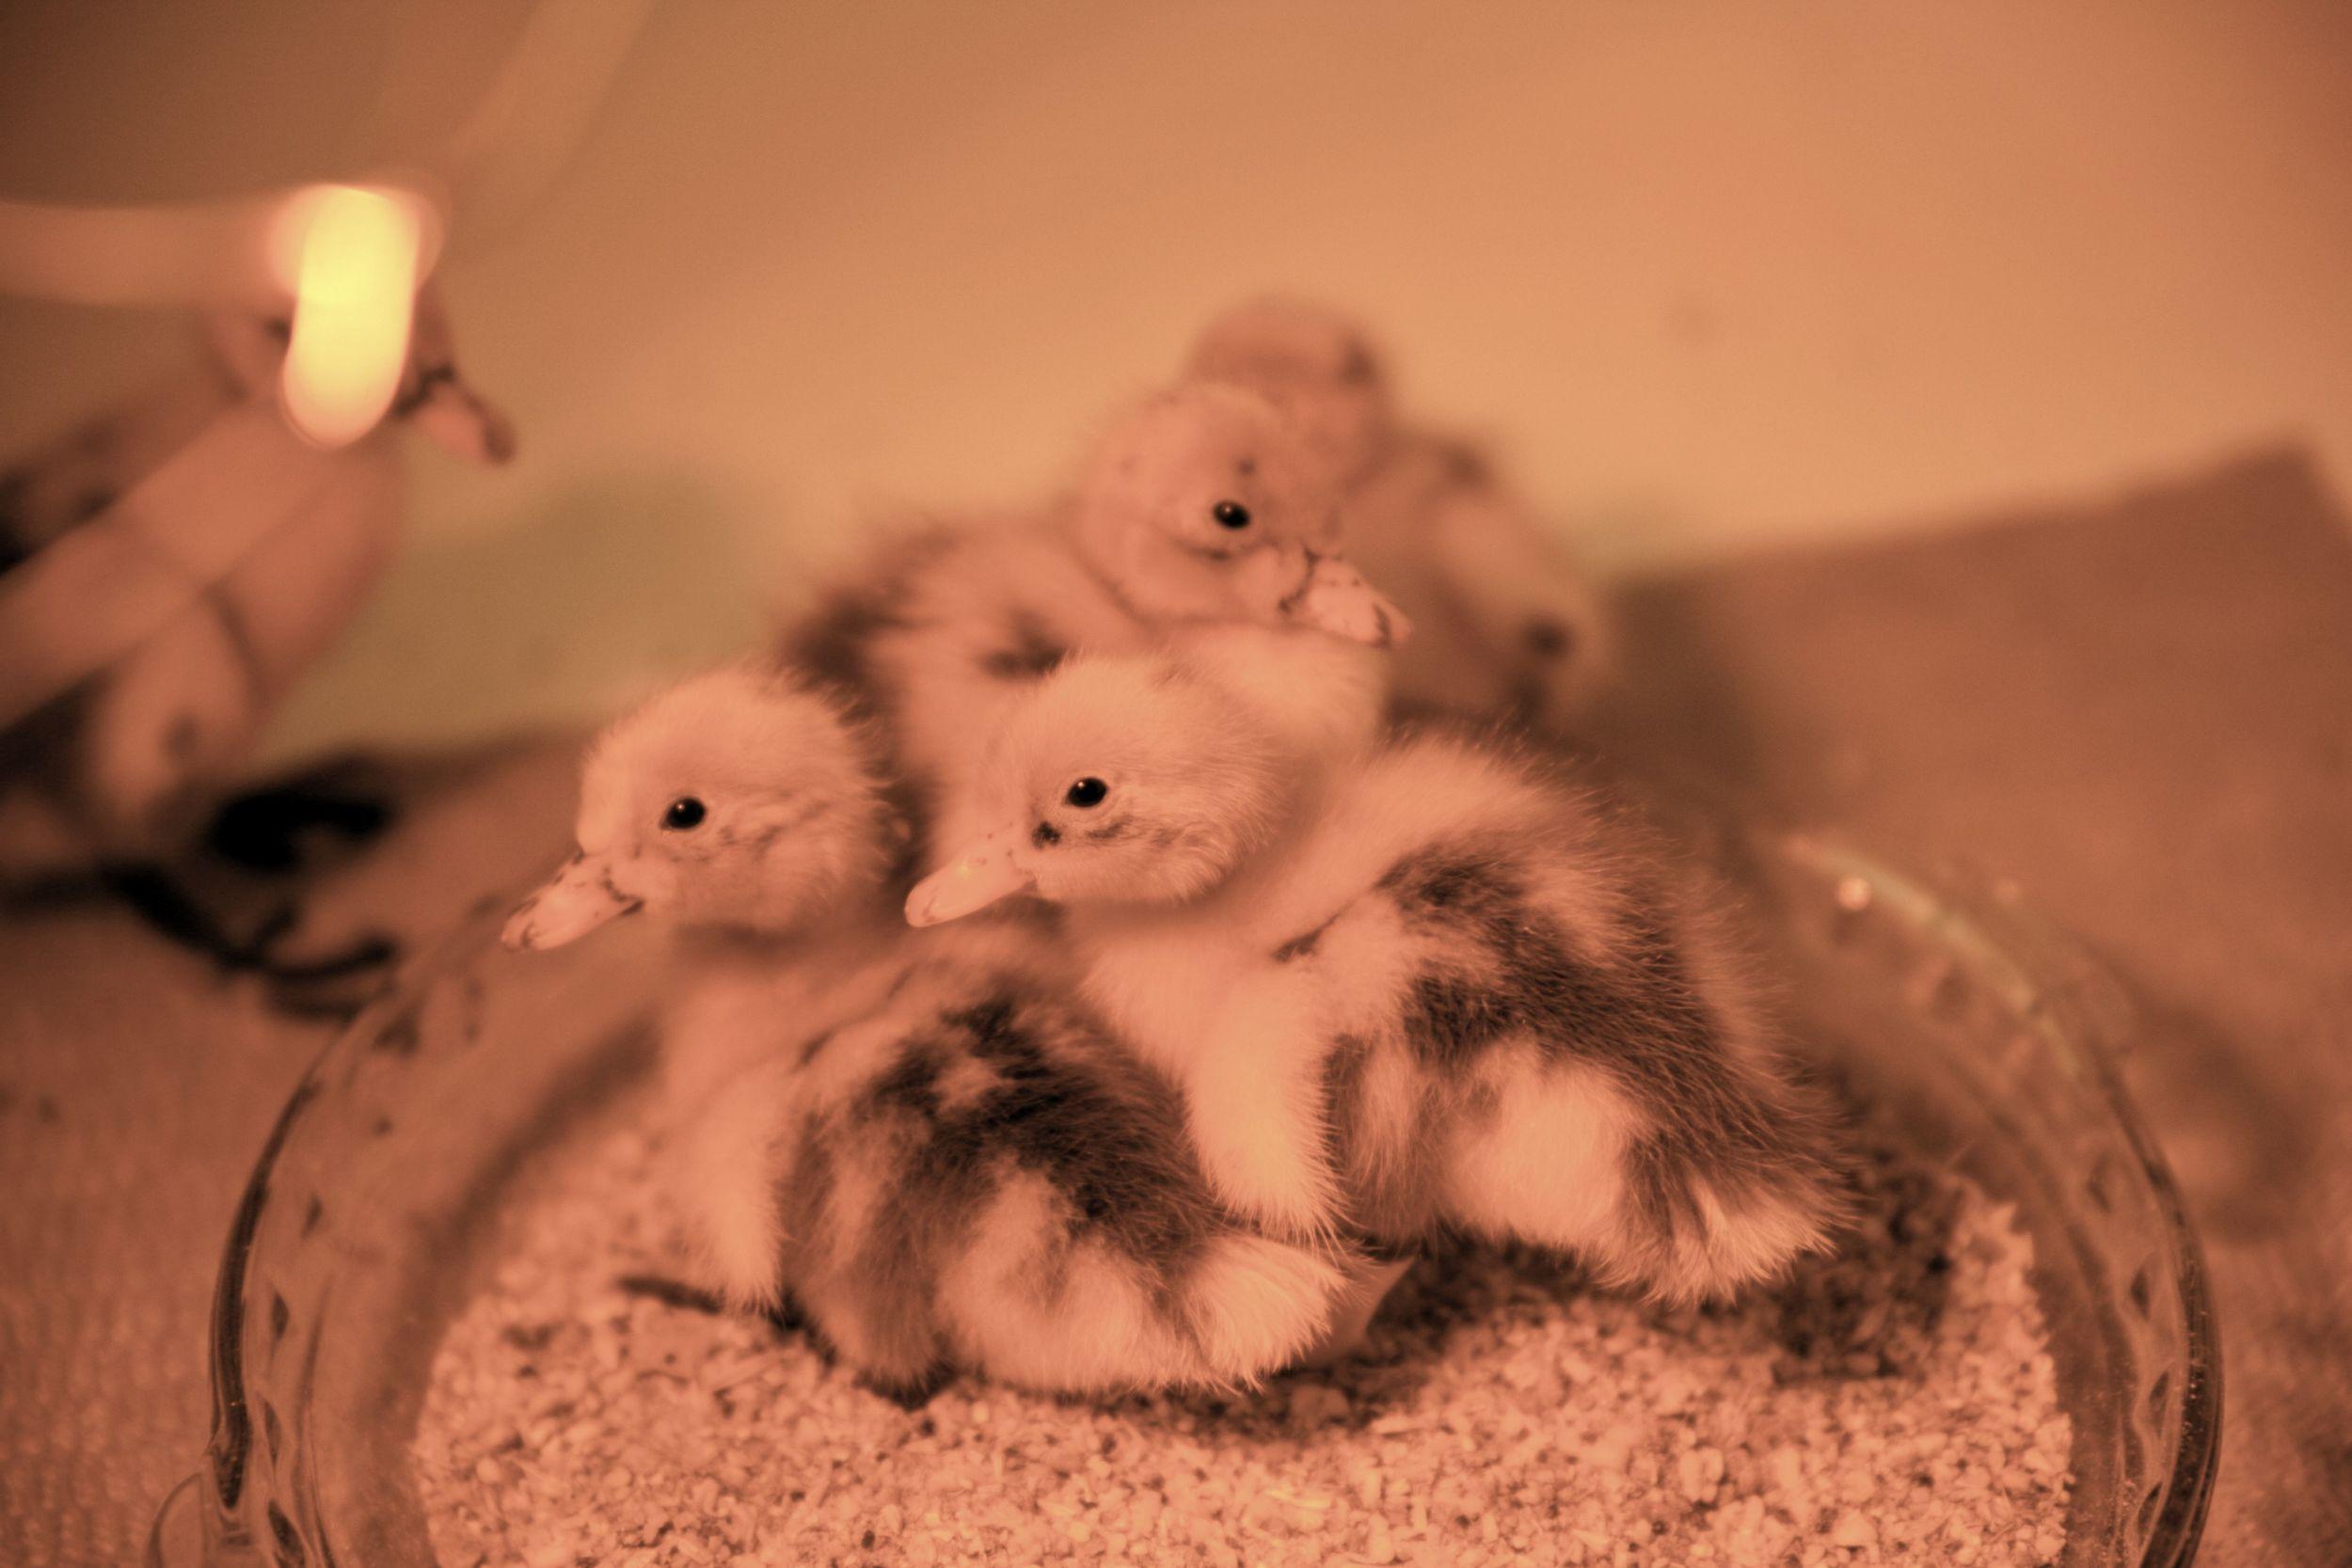 Ducklingdish.jpg